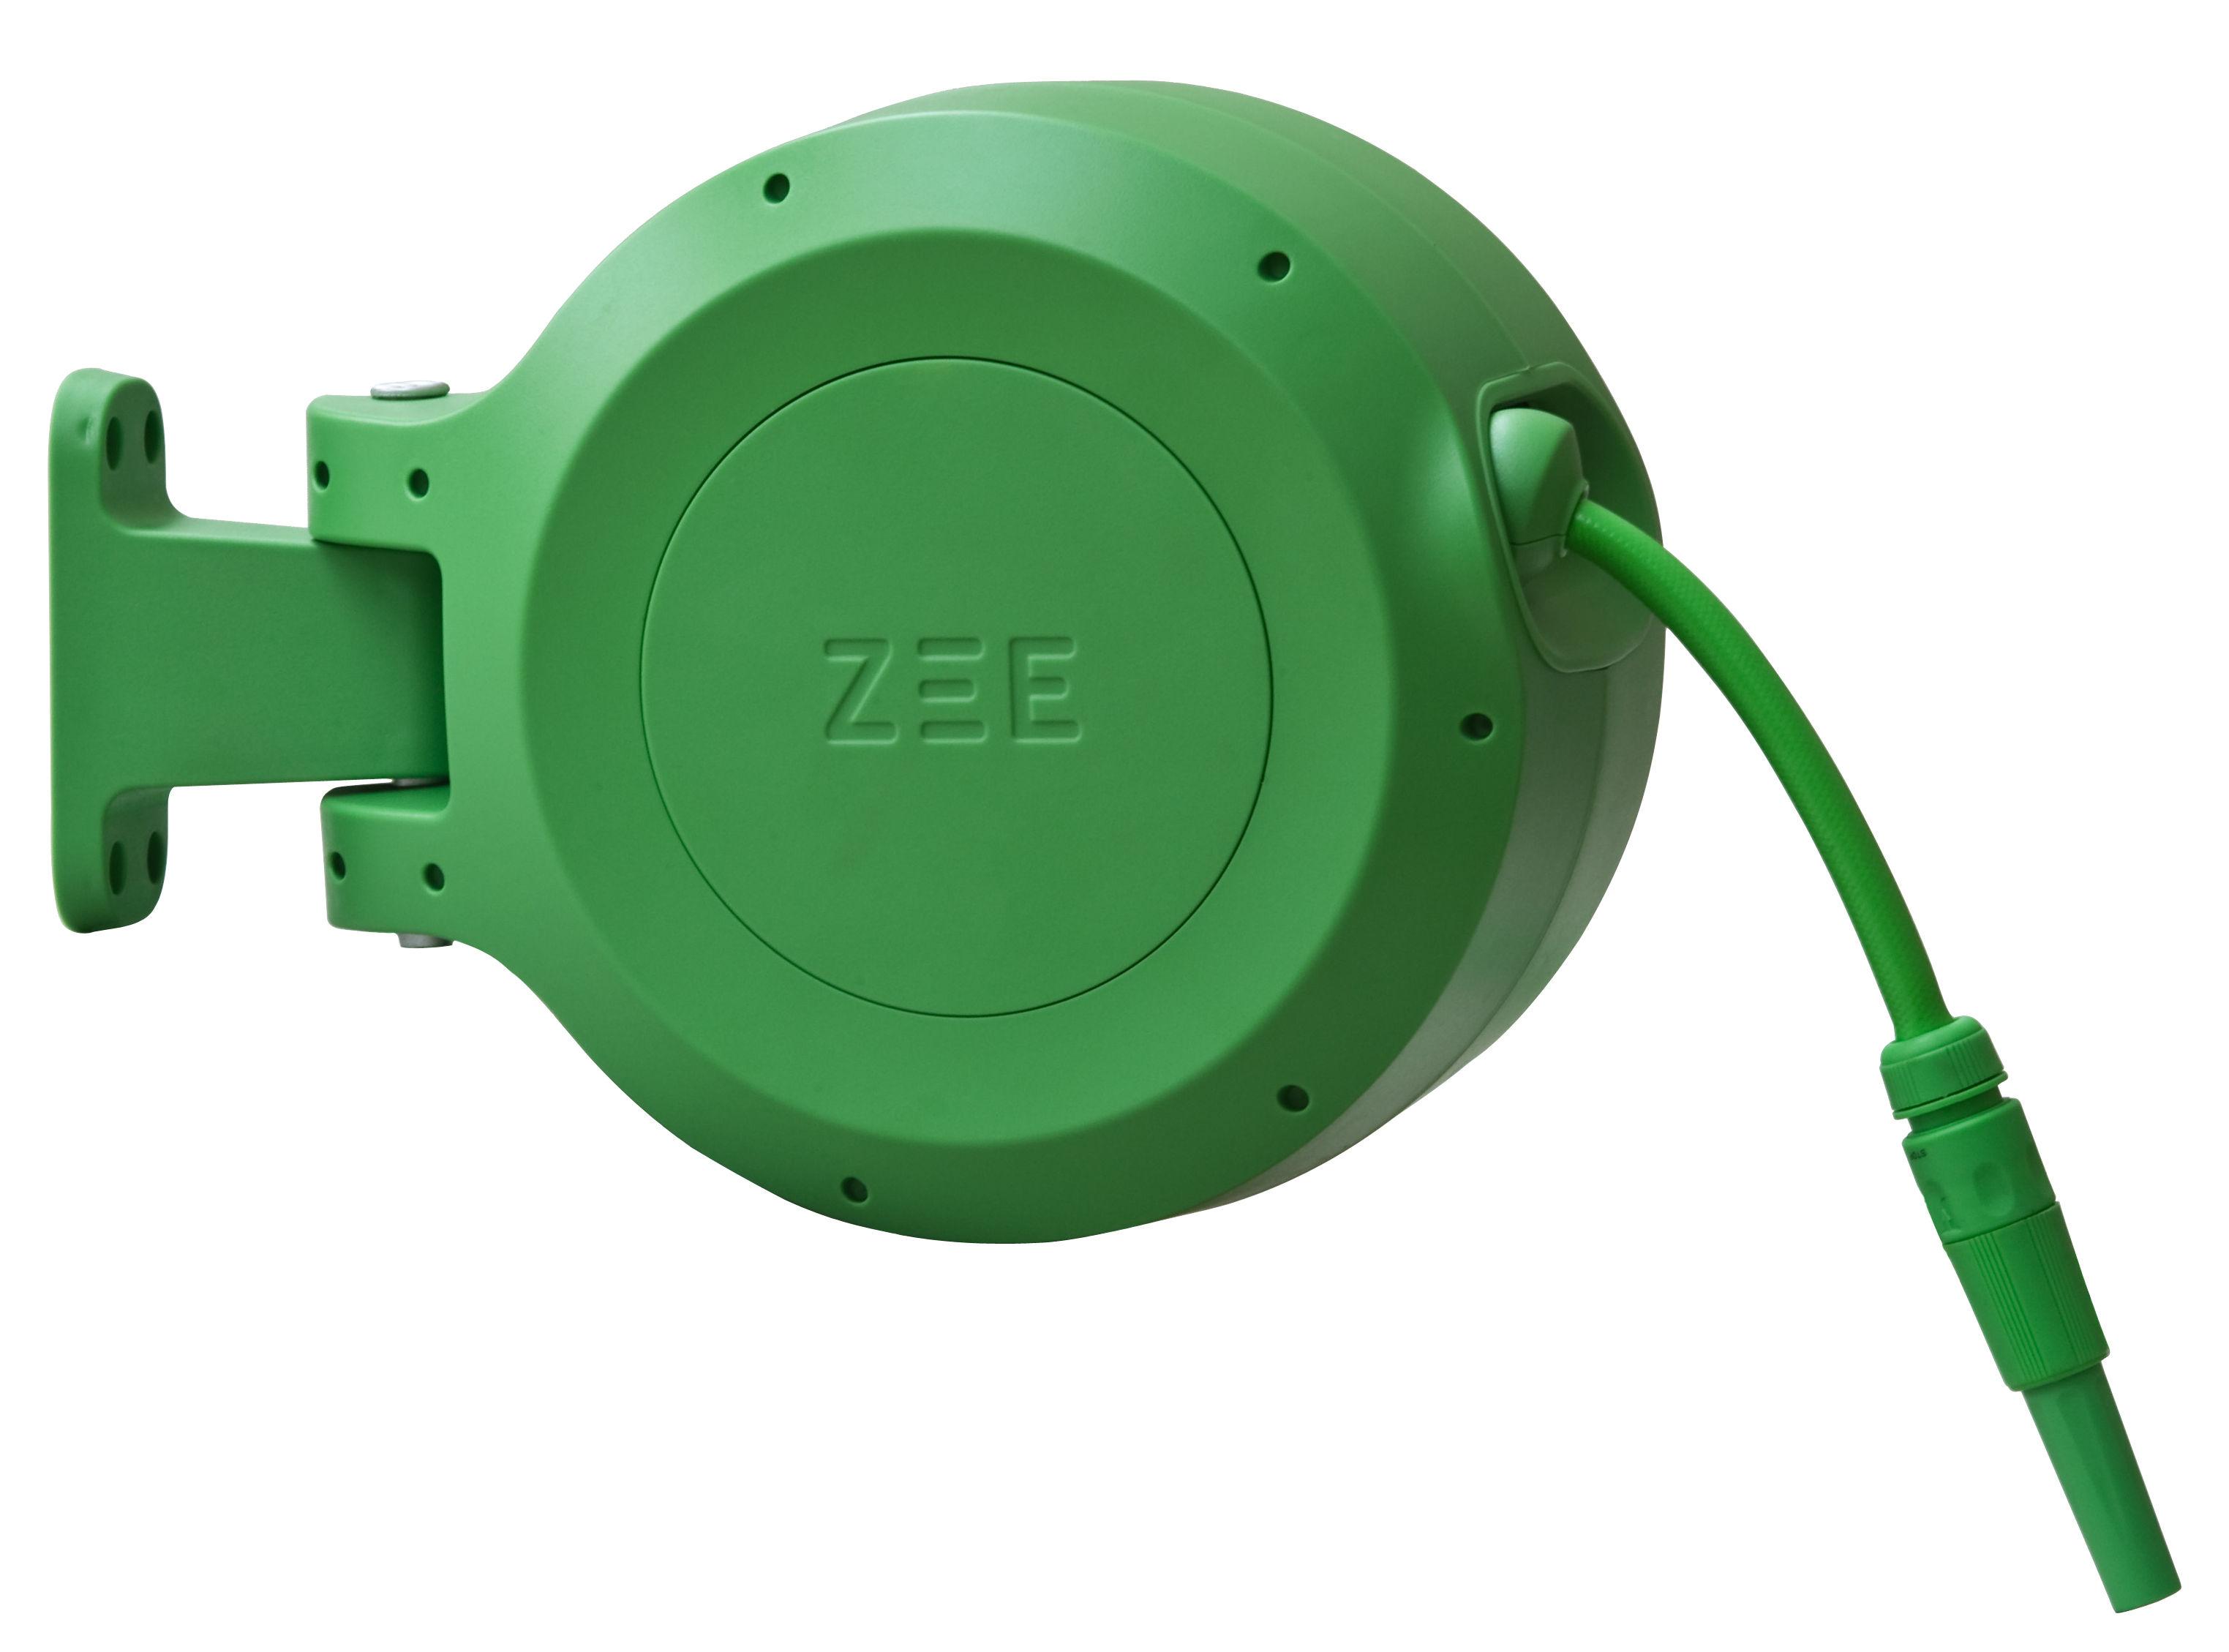 Outdoor - Pots & Plants - Mirtoon Garden hose by Zee - Green - ABS, PVC